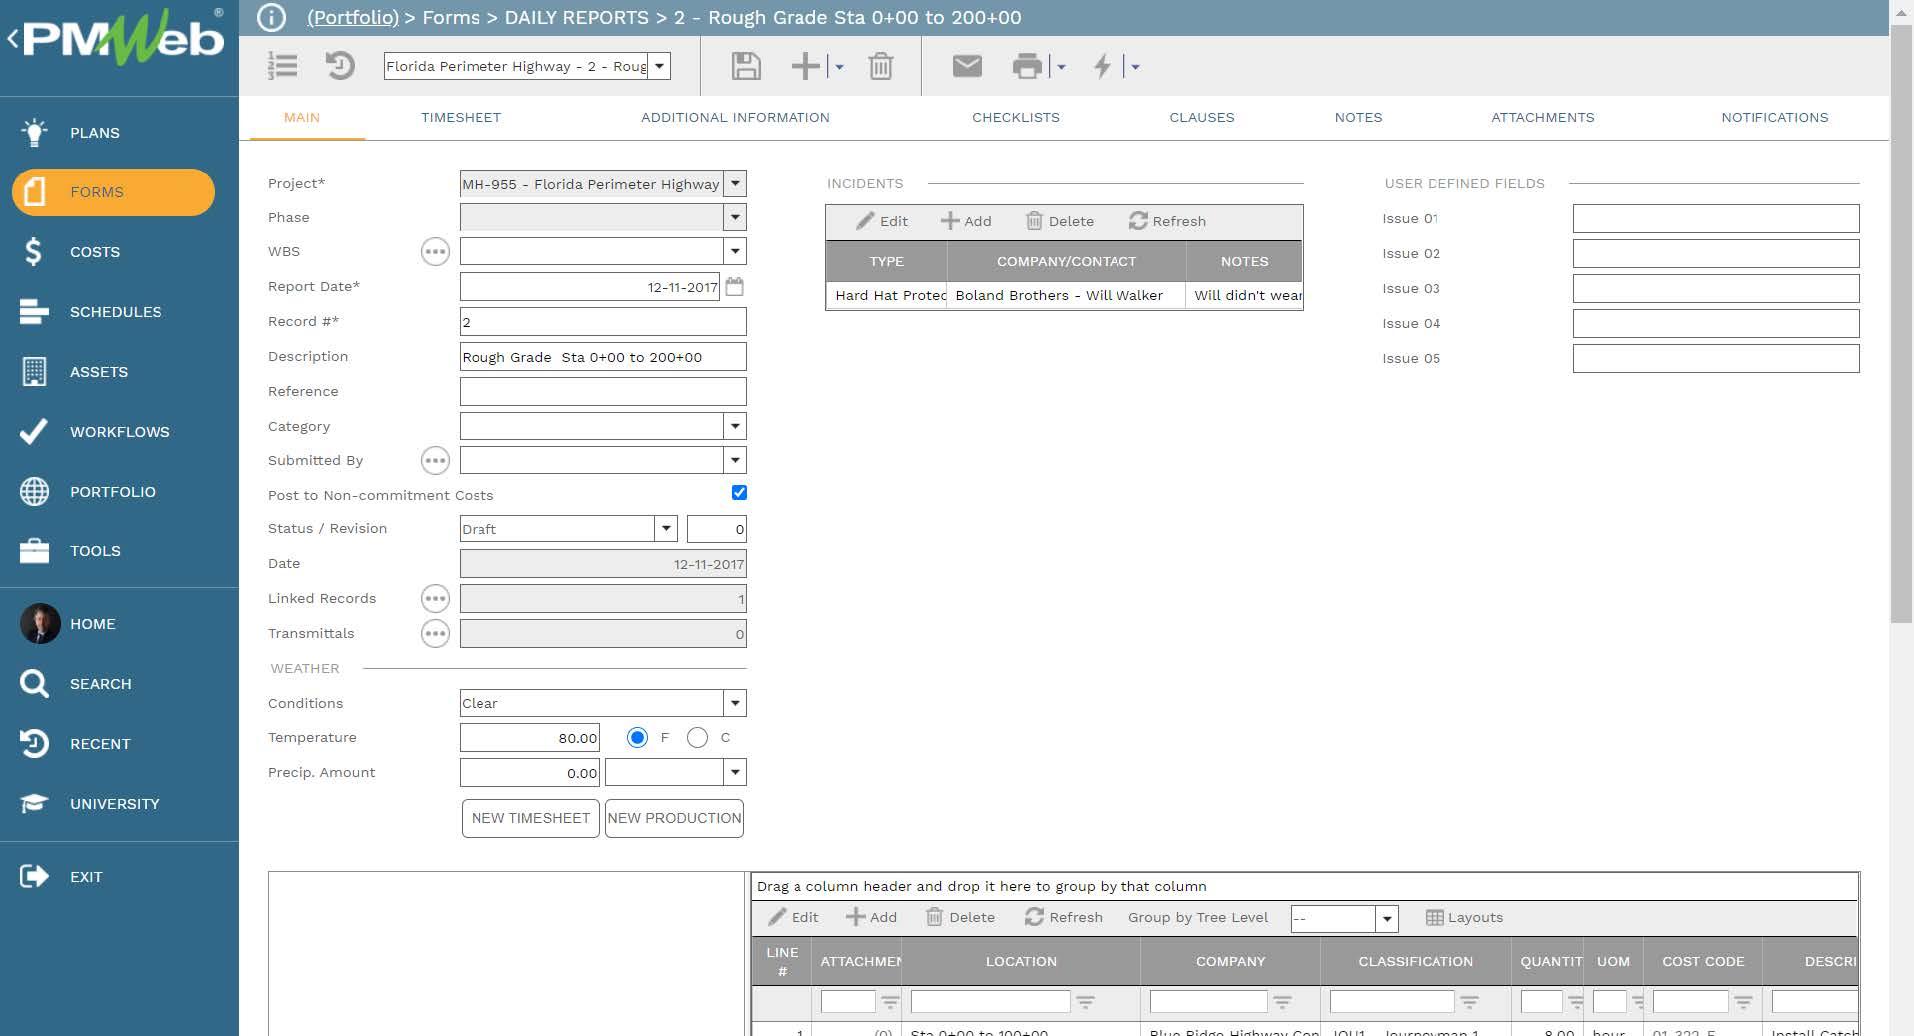 PMWeb 7 Forms Daily Reports Rough Grade Sta Main